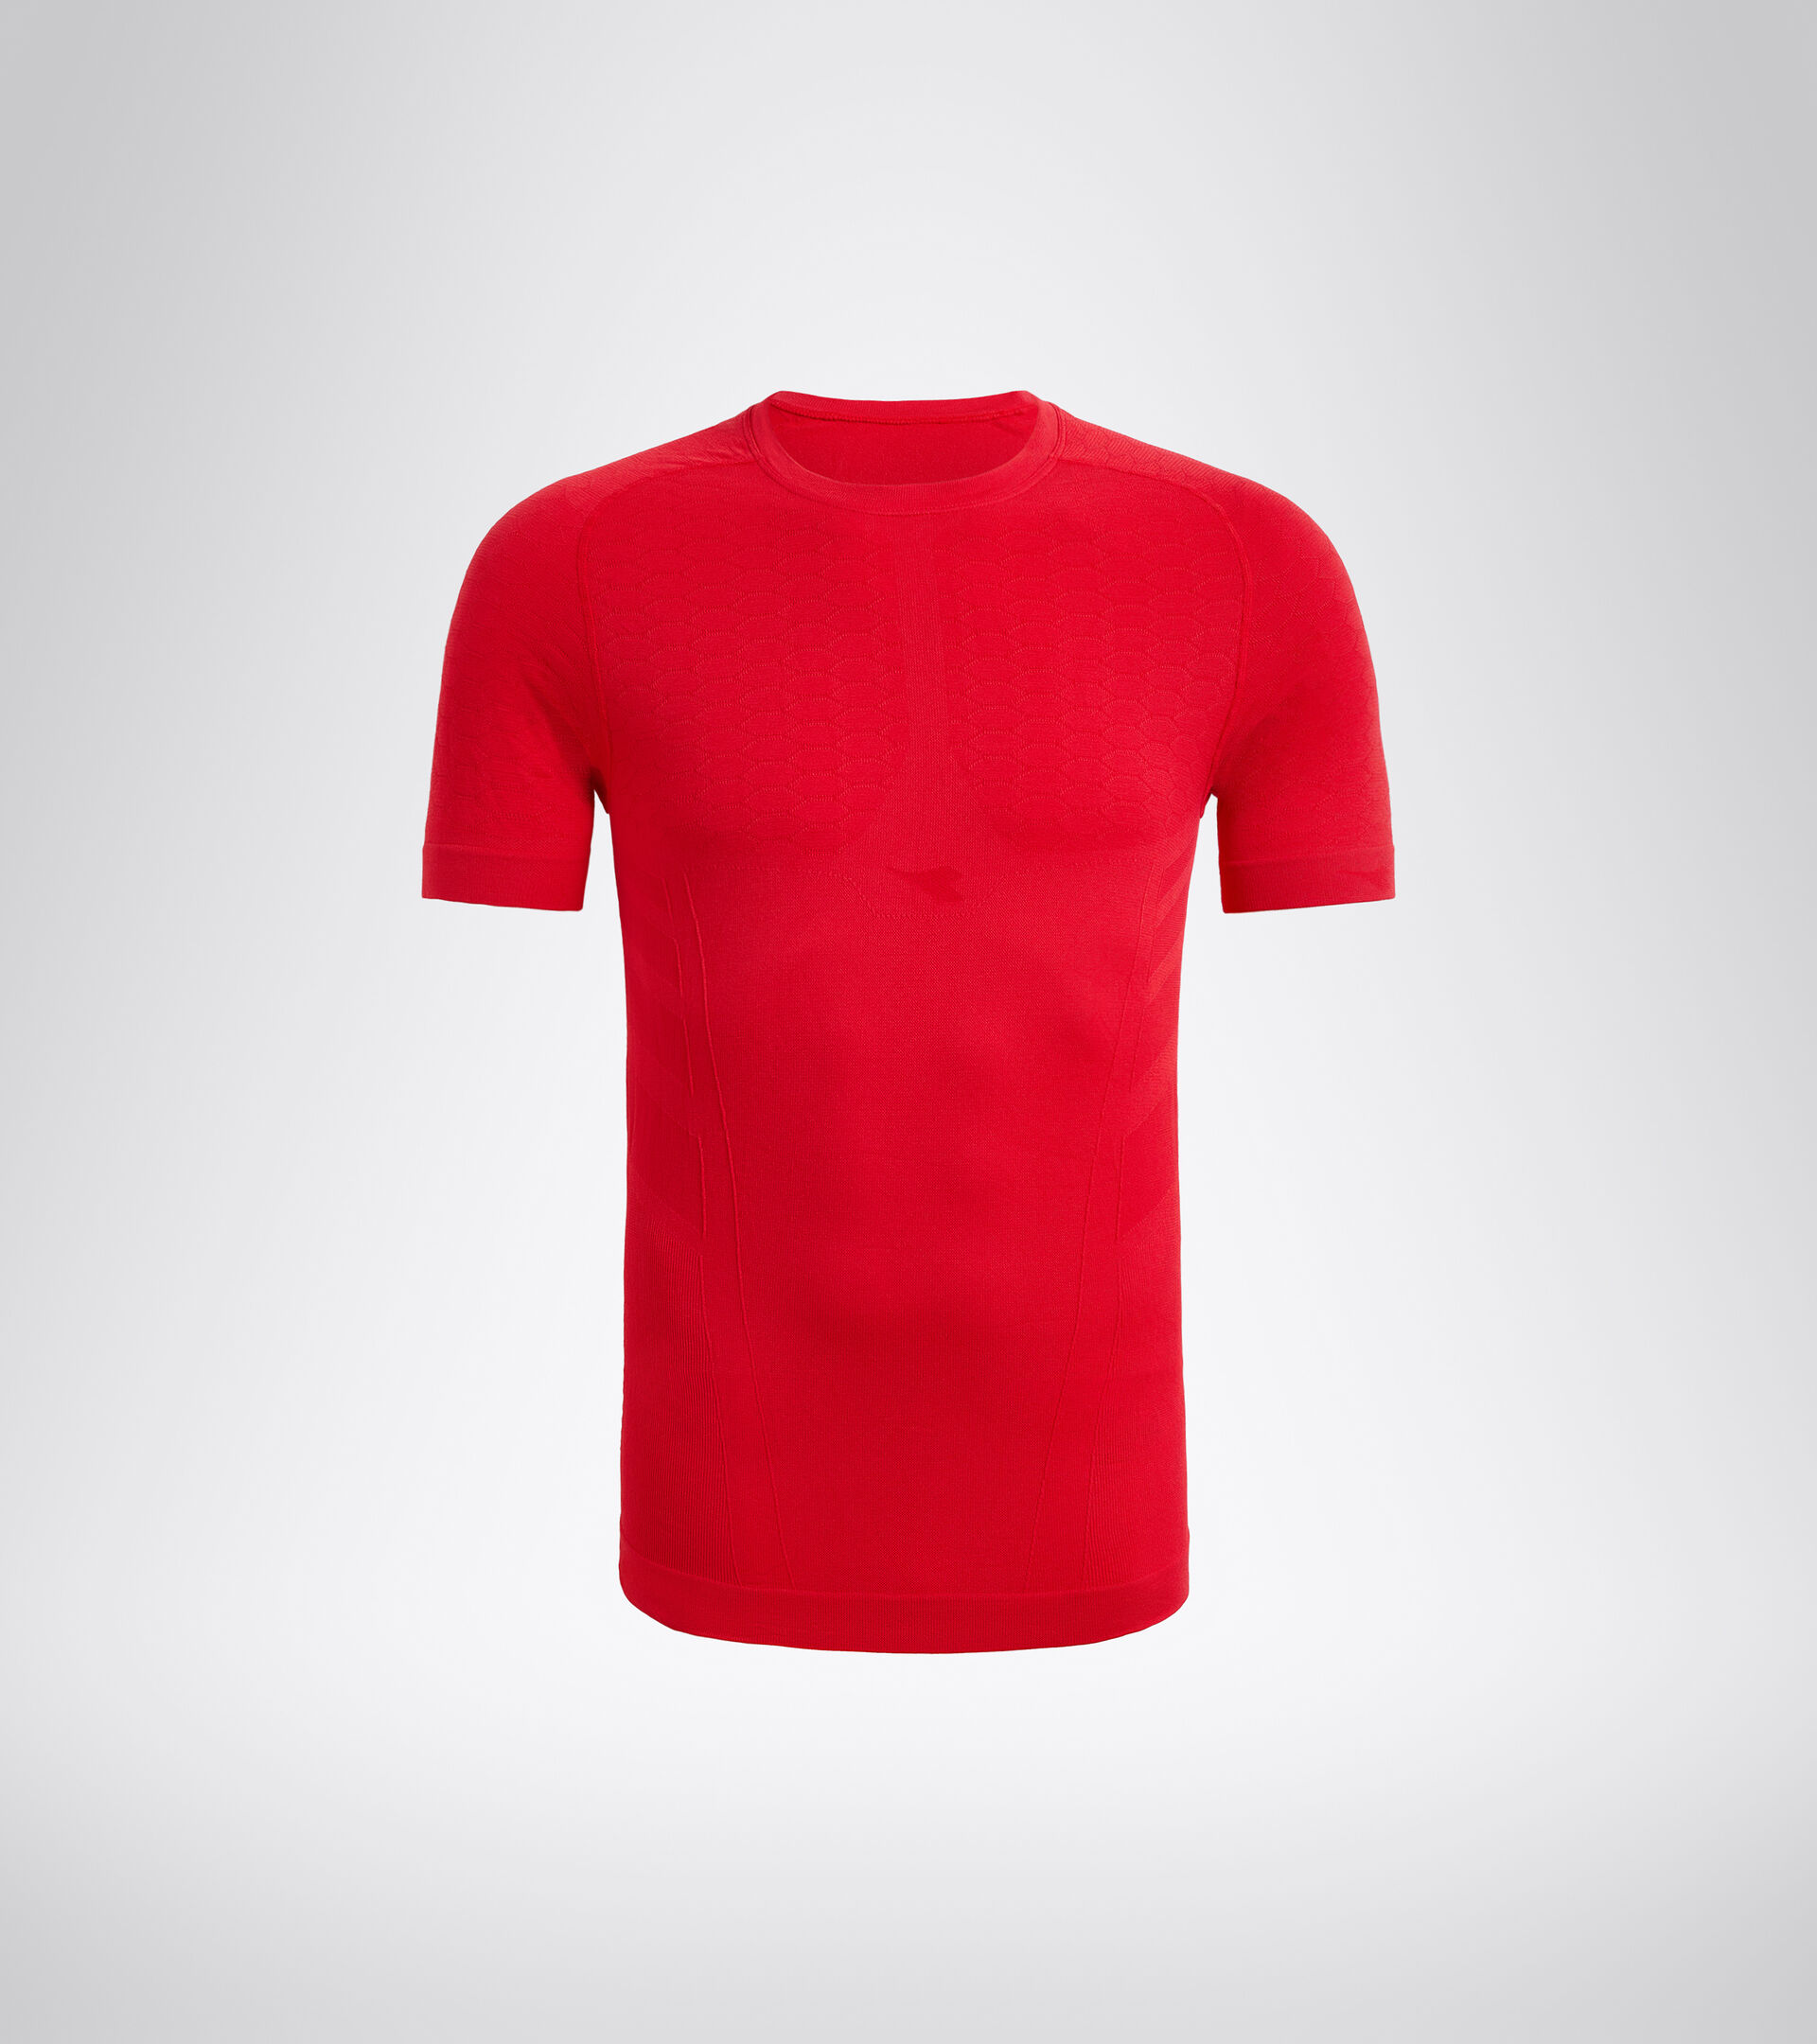 Trainings-T-Shirt - Herren SS T-SHIRT ACT LYZEE ROT - Diadora